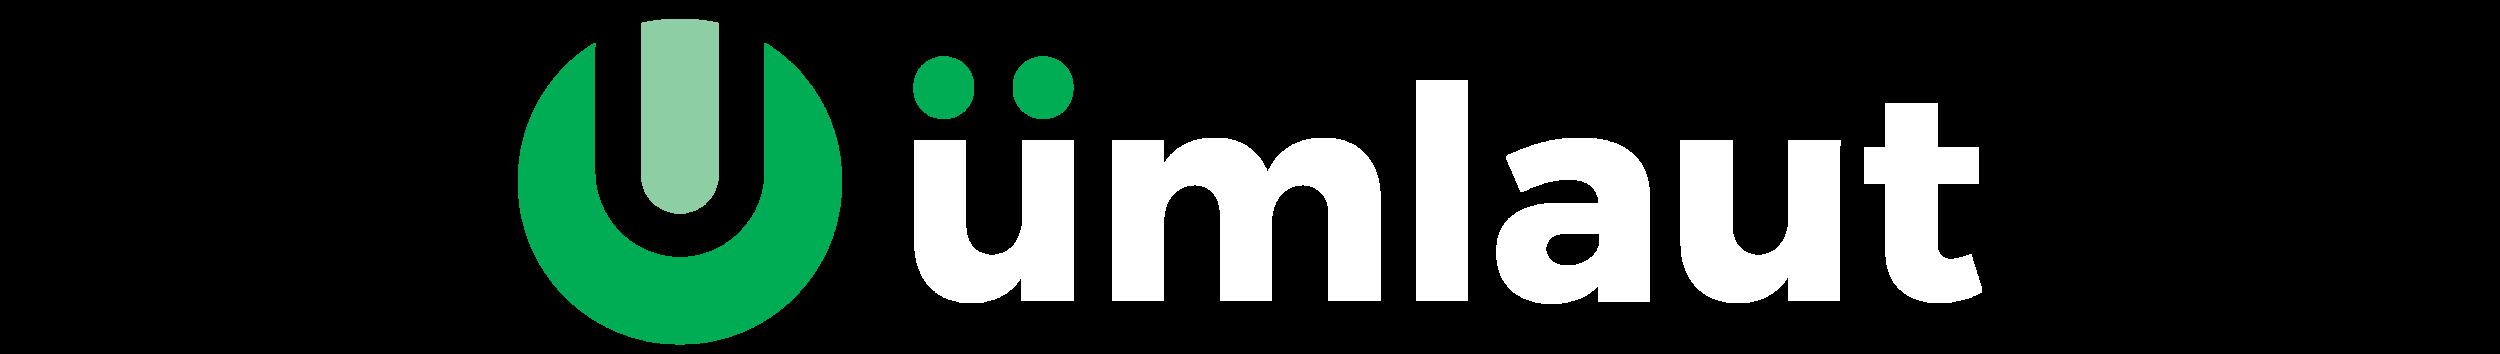 UML-small-format-footer_v.png